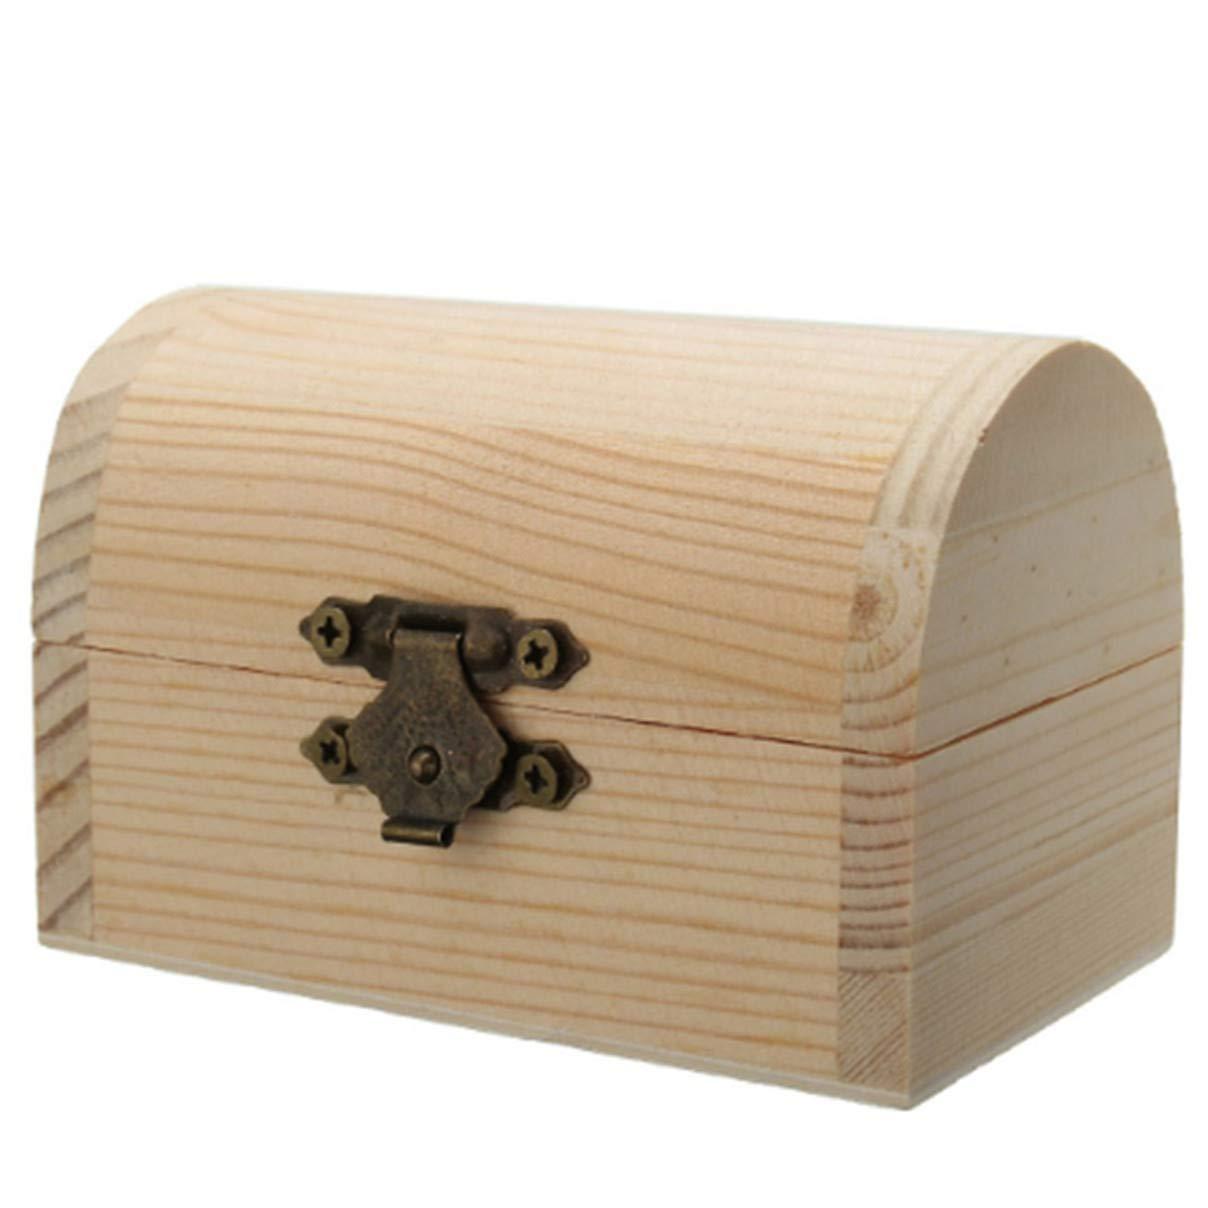 Essencedelight Storage Case Wooden Box Jewelry Case Ring Necklace Holder Gift Light Storage Box Organizer Decorate for Girls